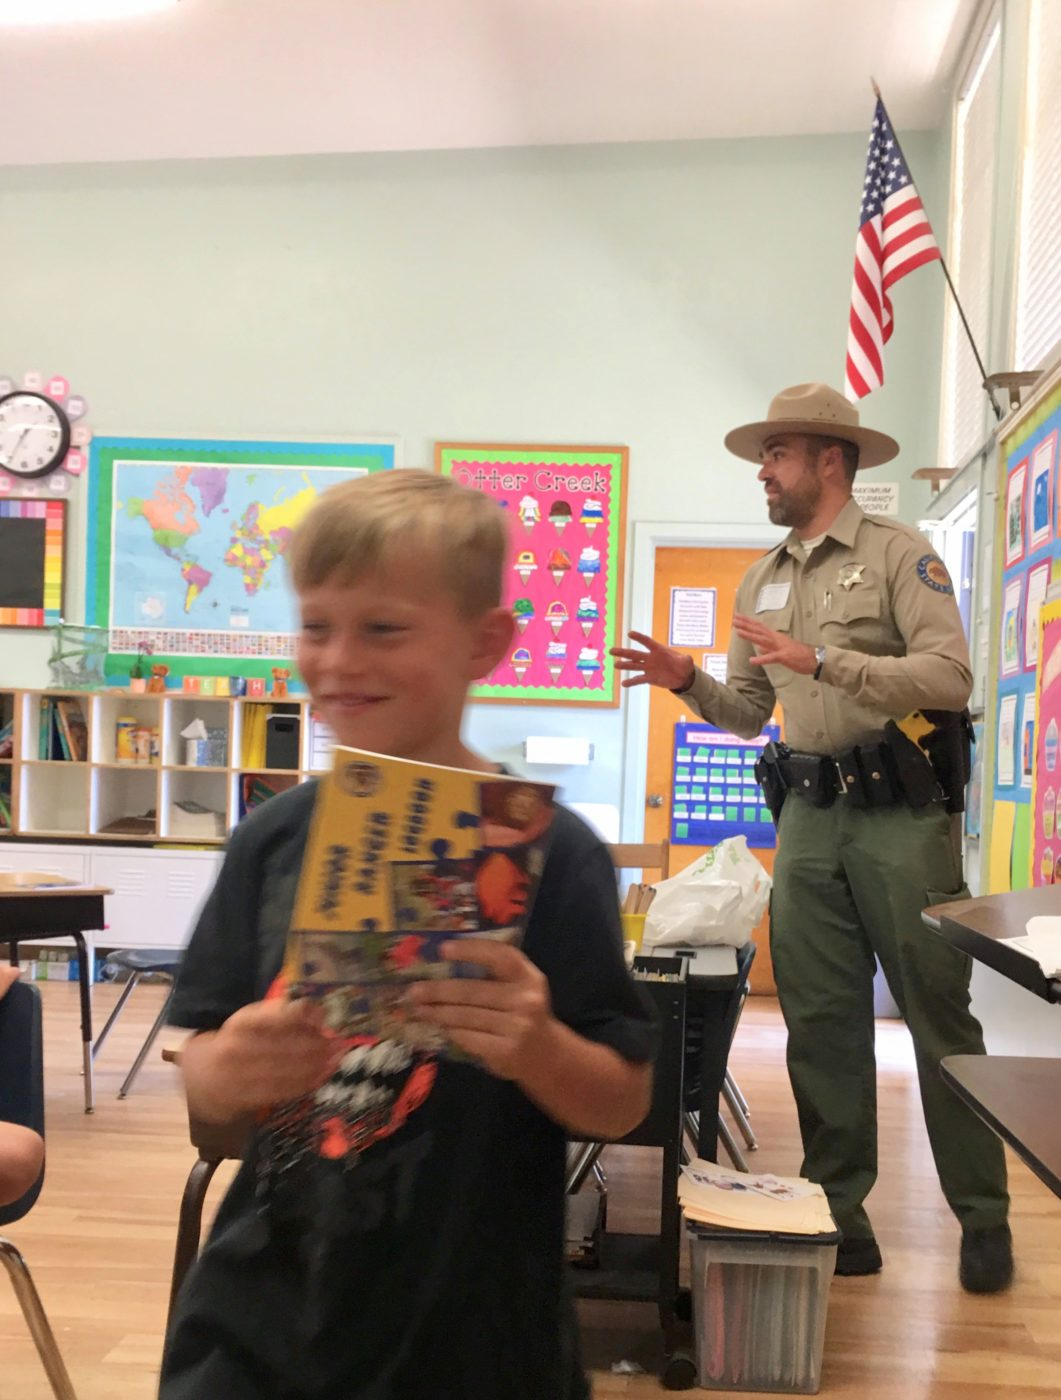 State Parks Ranger John Geno Lucich Visits School in Montecito